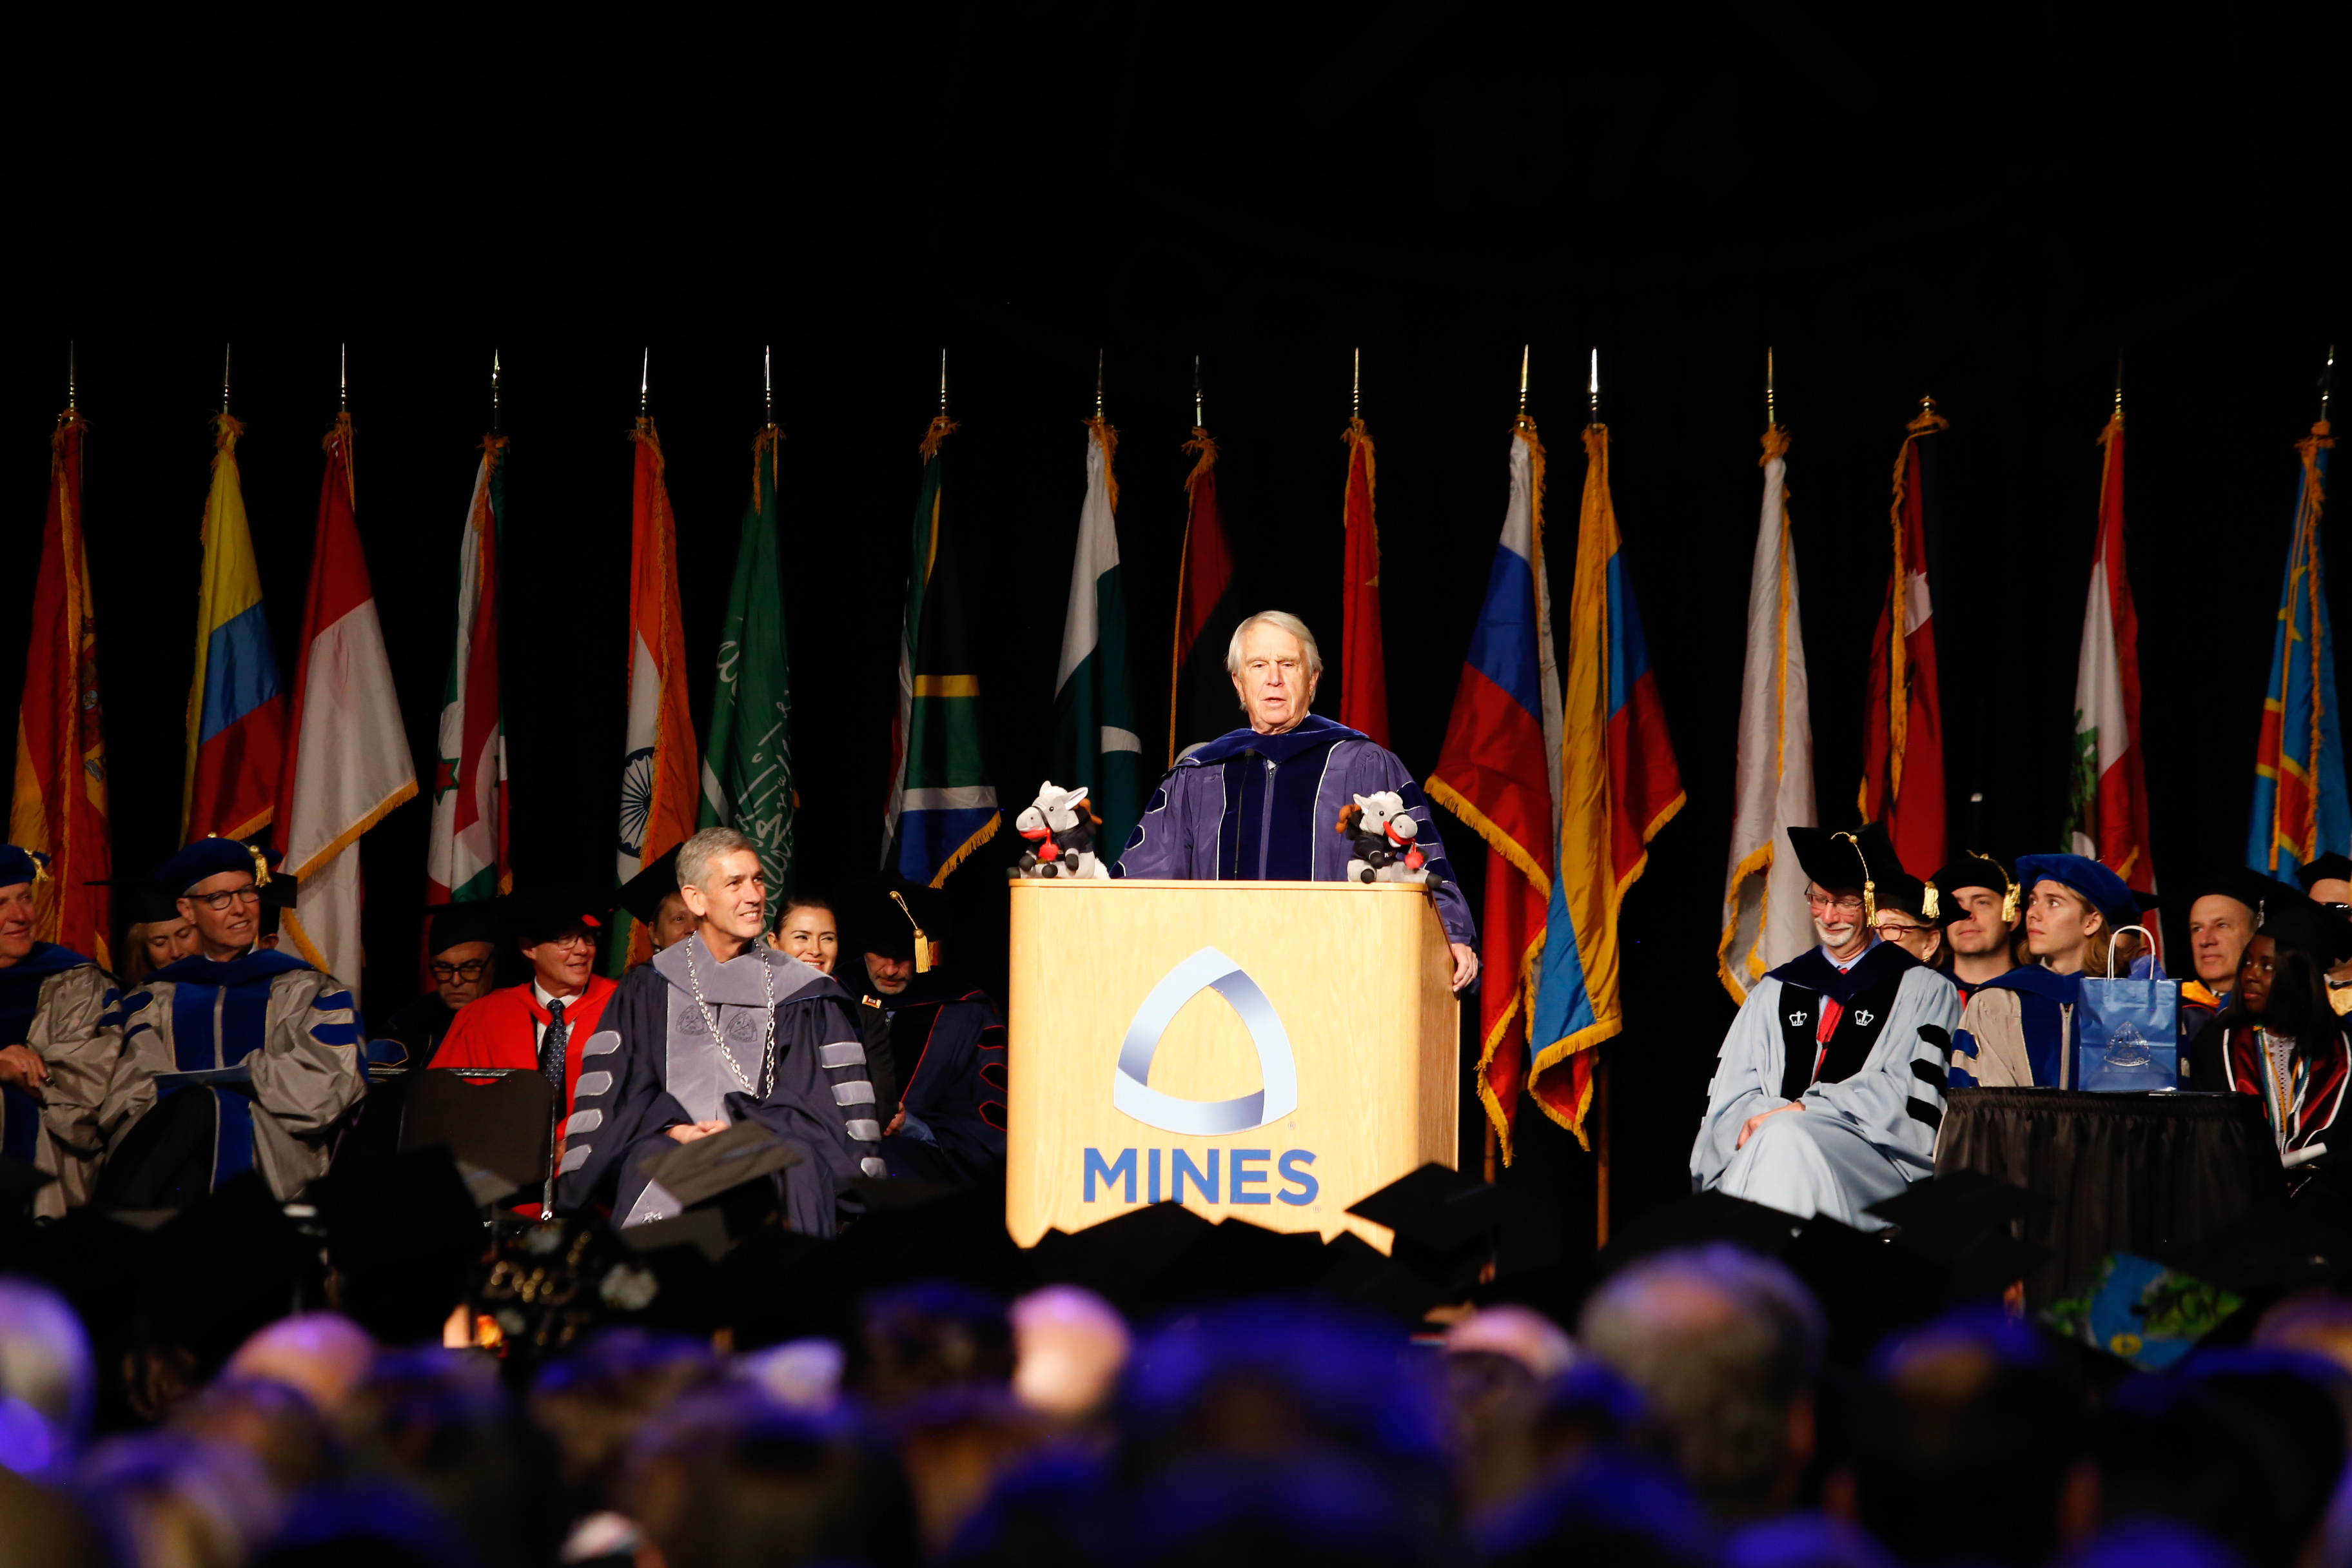 Undergraduate keynote speaker Jim Payne '59 addresses the crowd